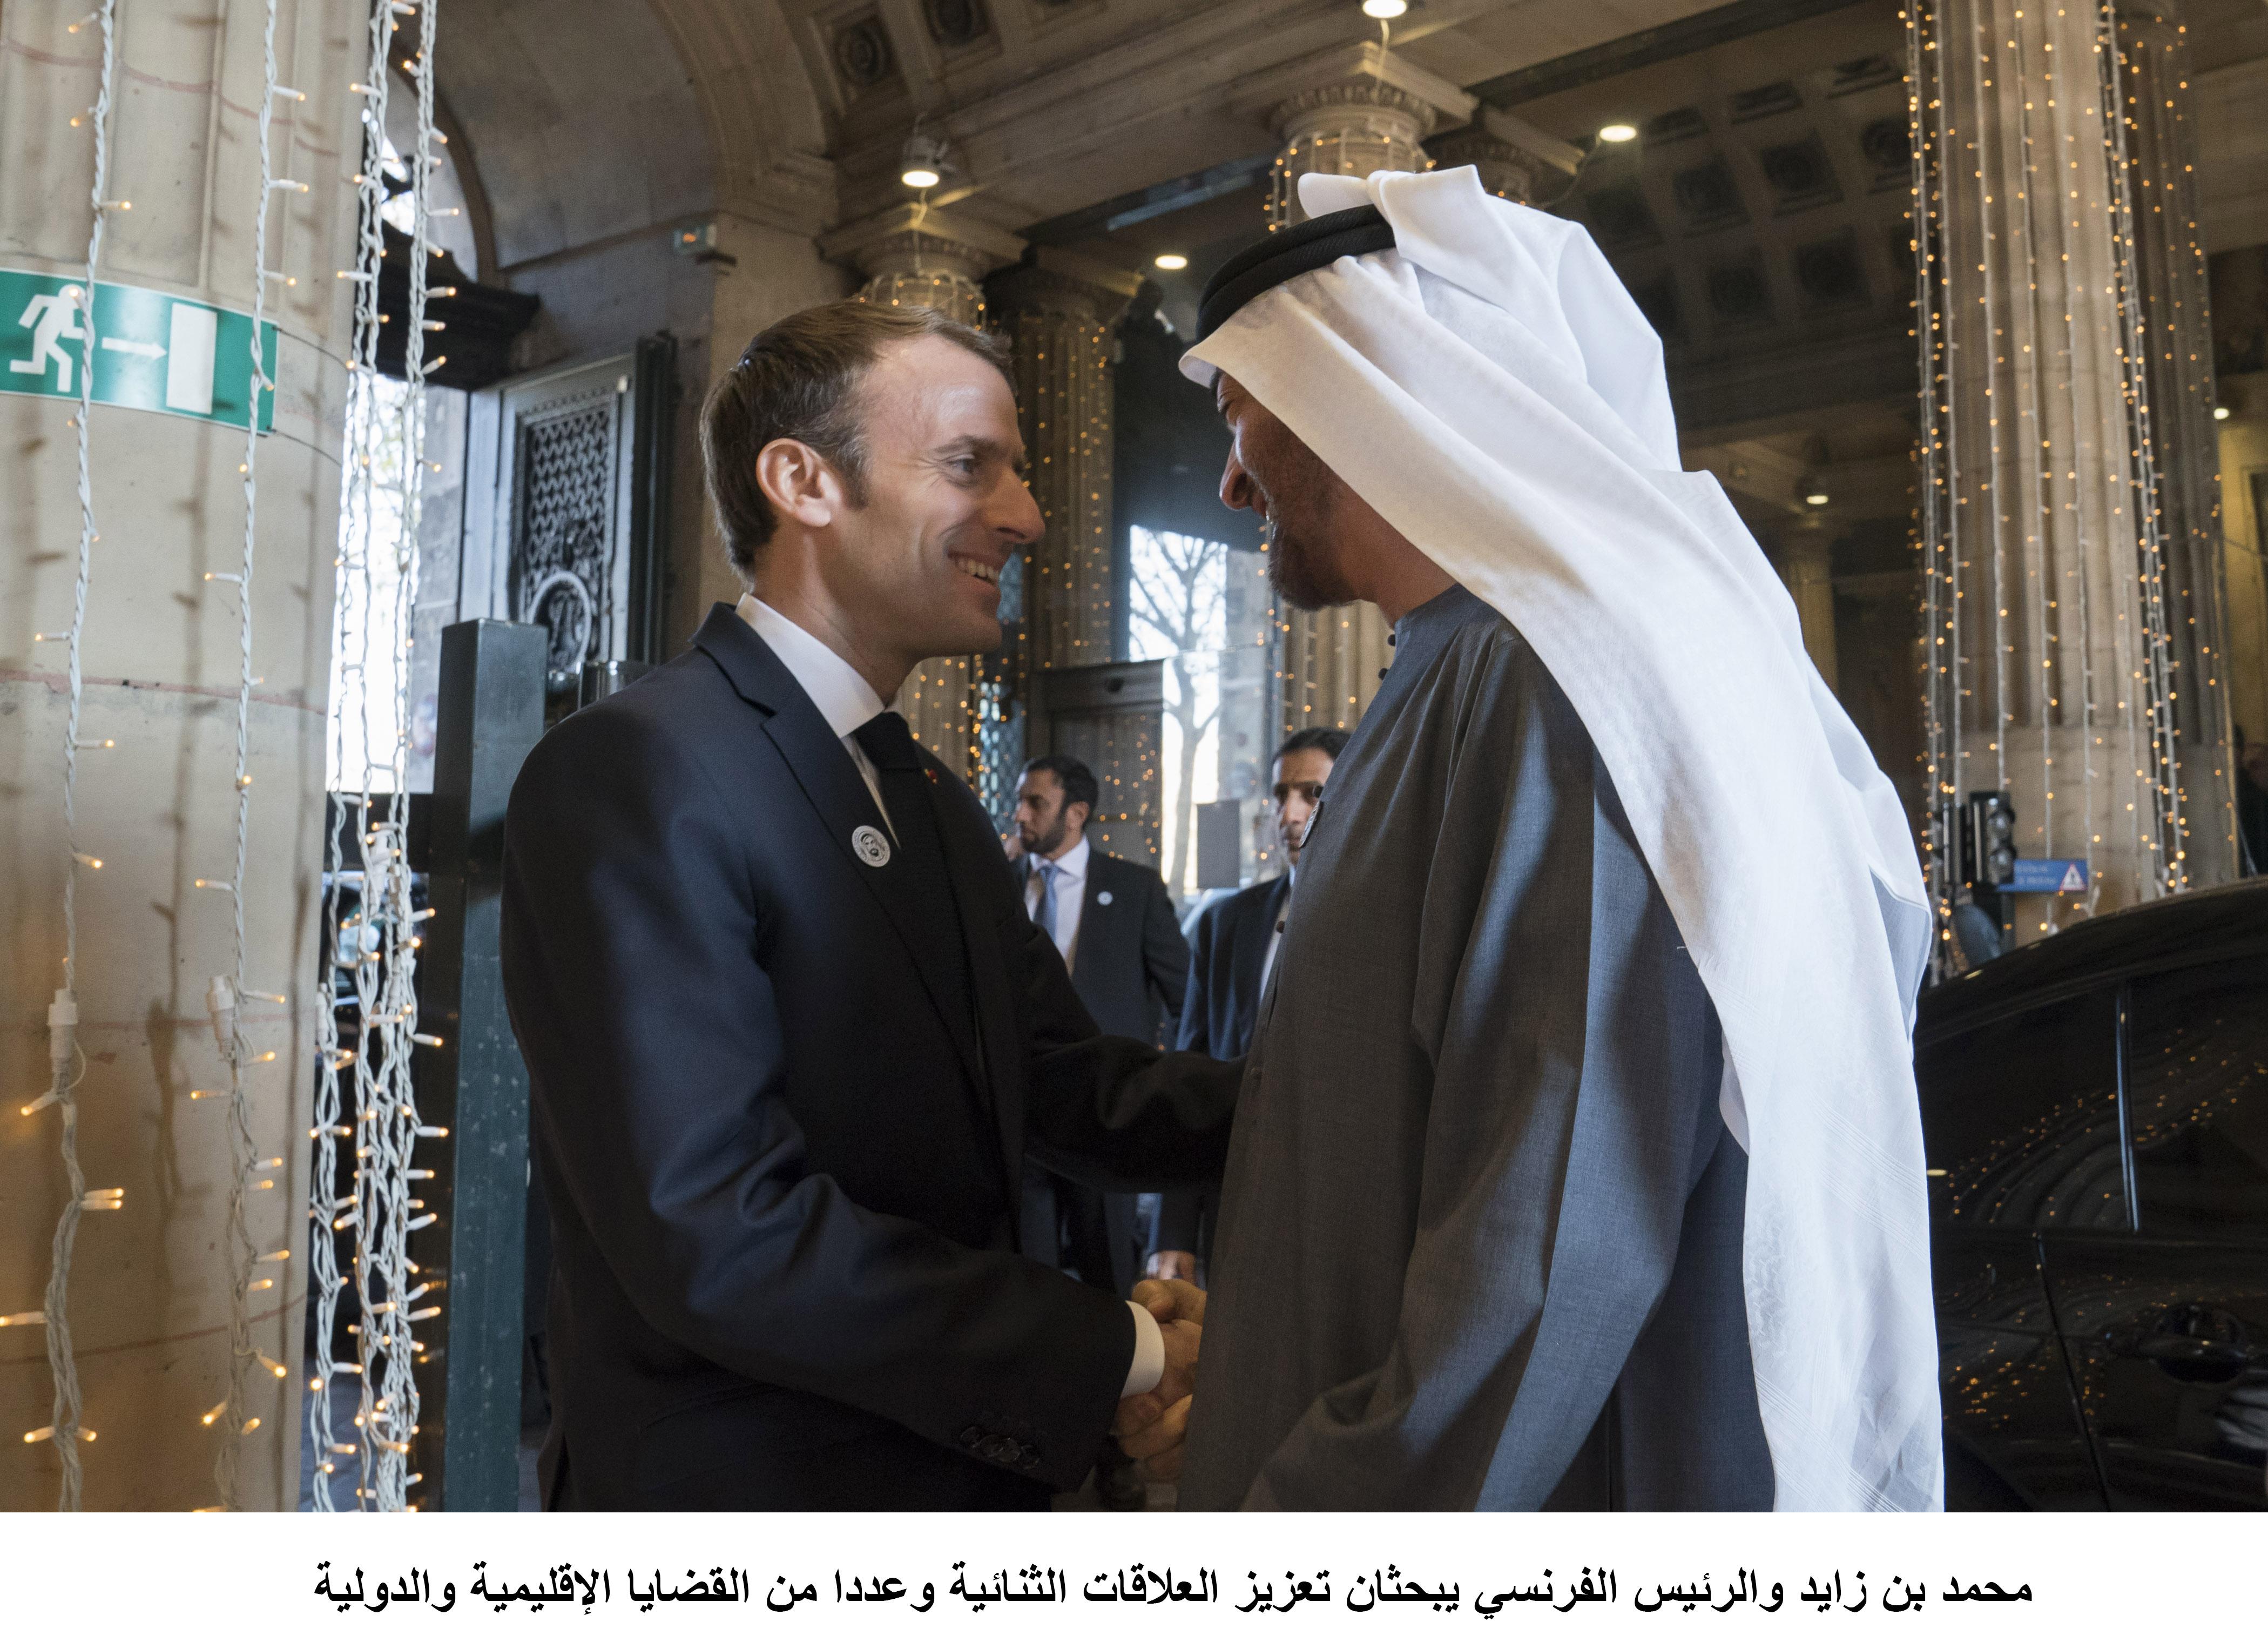 rencontres à Émirats Arabes Unis Abu DhabiNaija datant